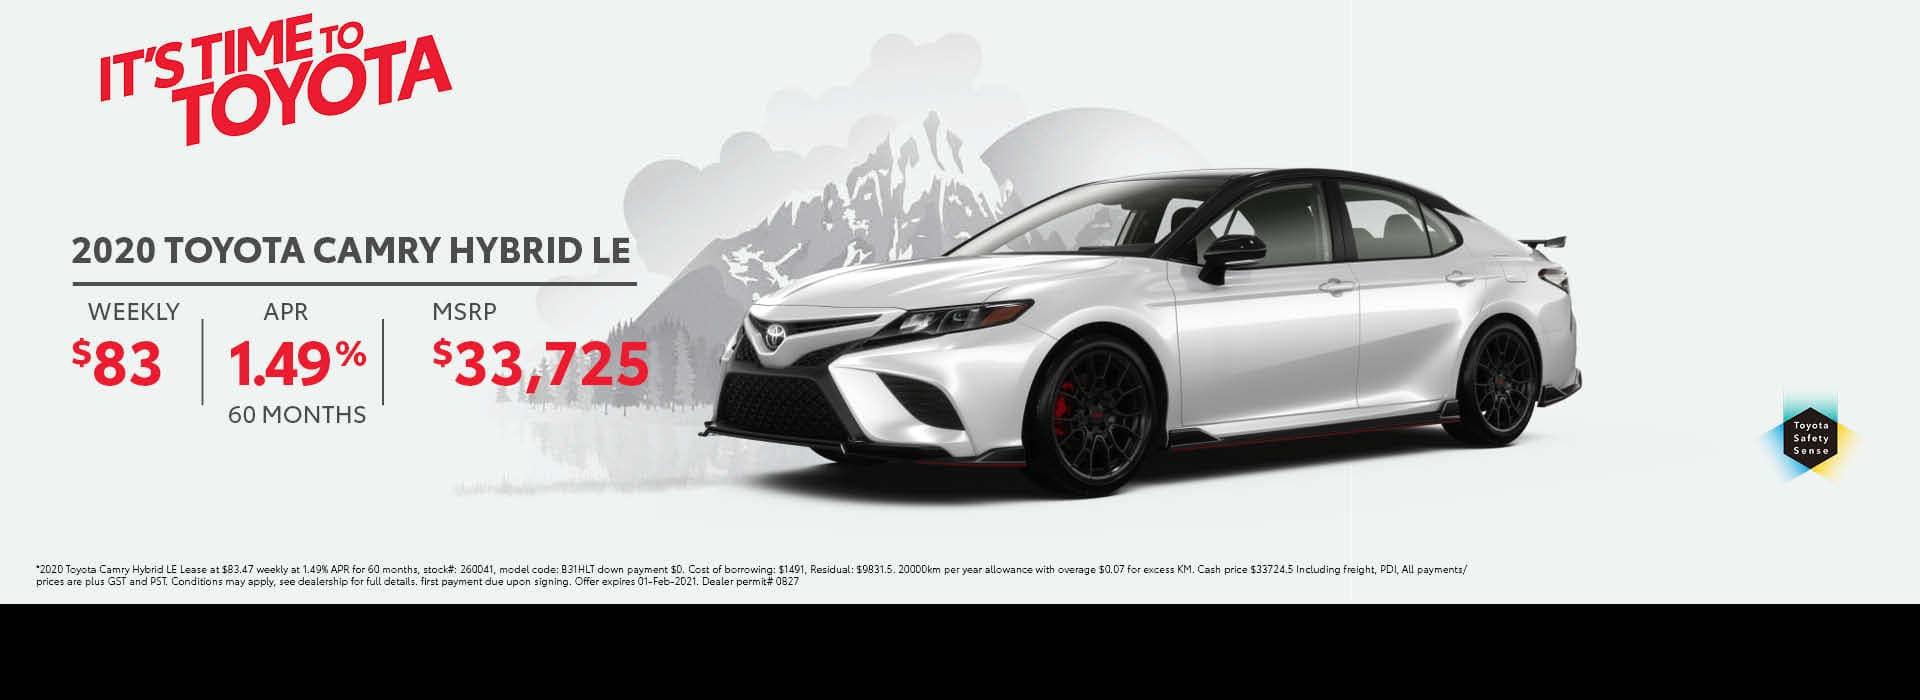 2020_Toyota_Camry_Hybrid_LE_Desktop_Jan2021